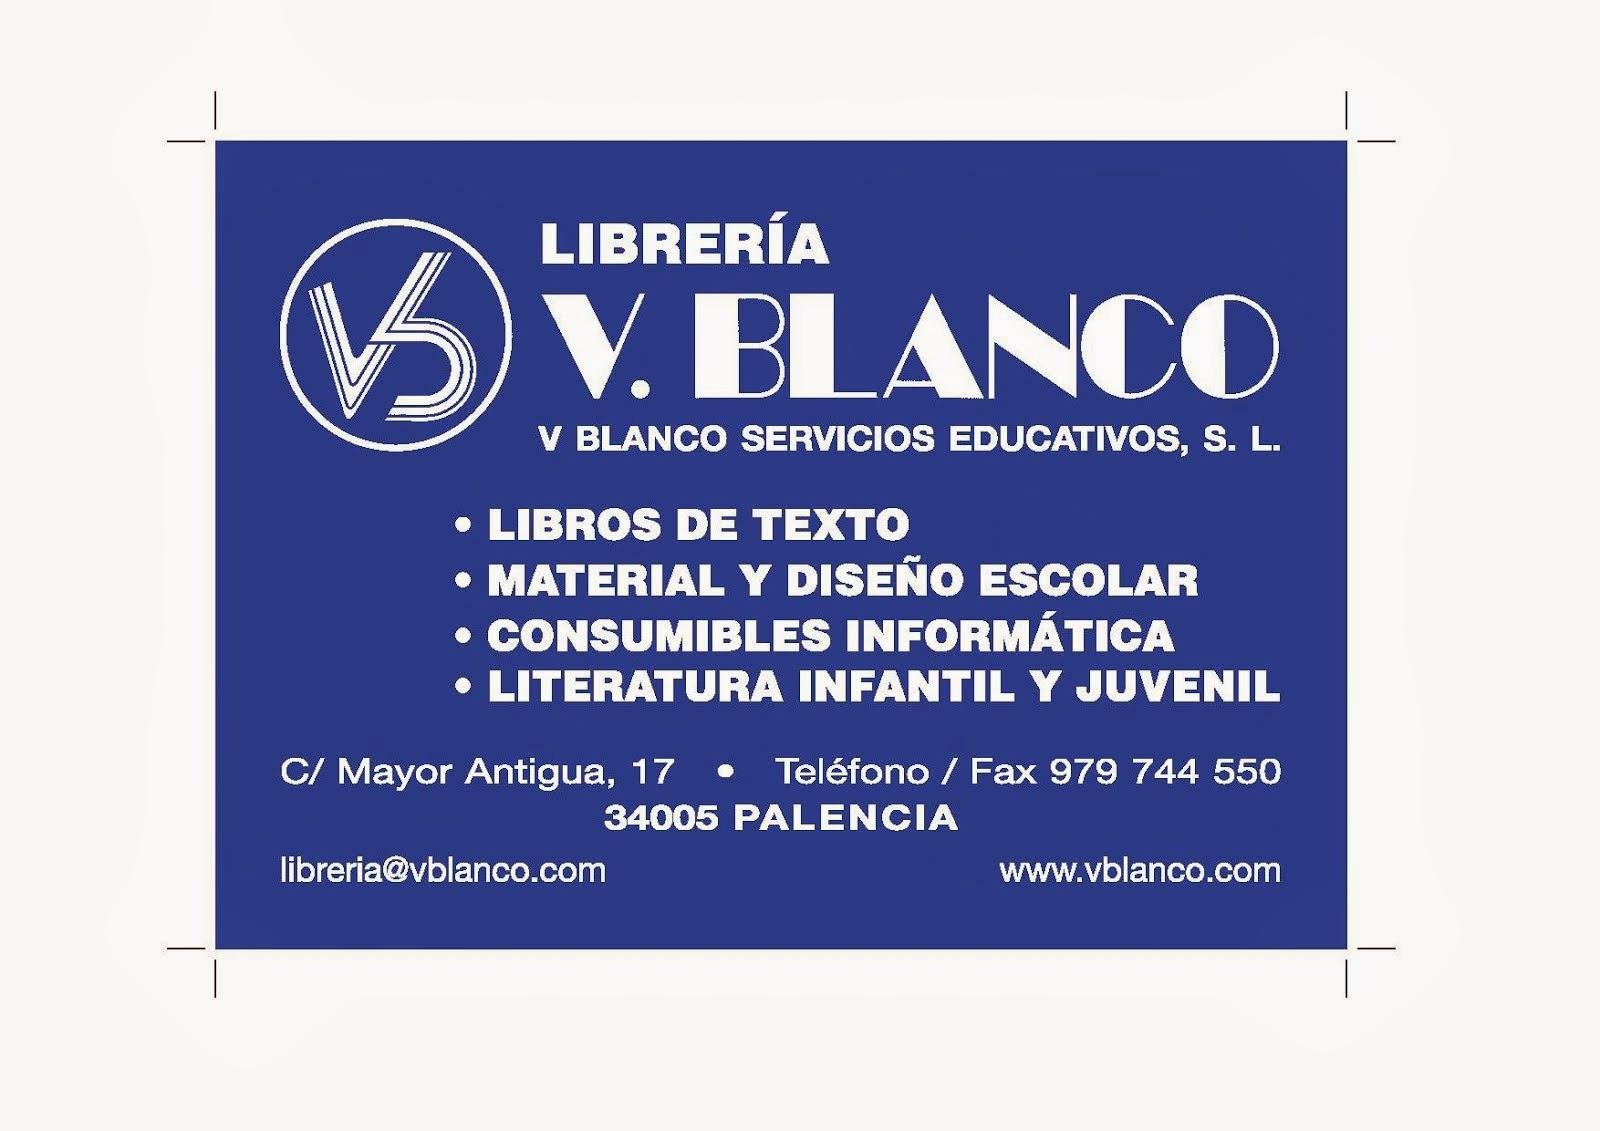 V.Blanco